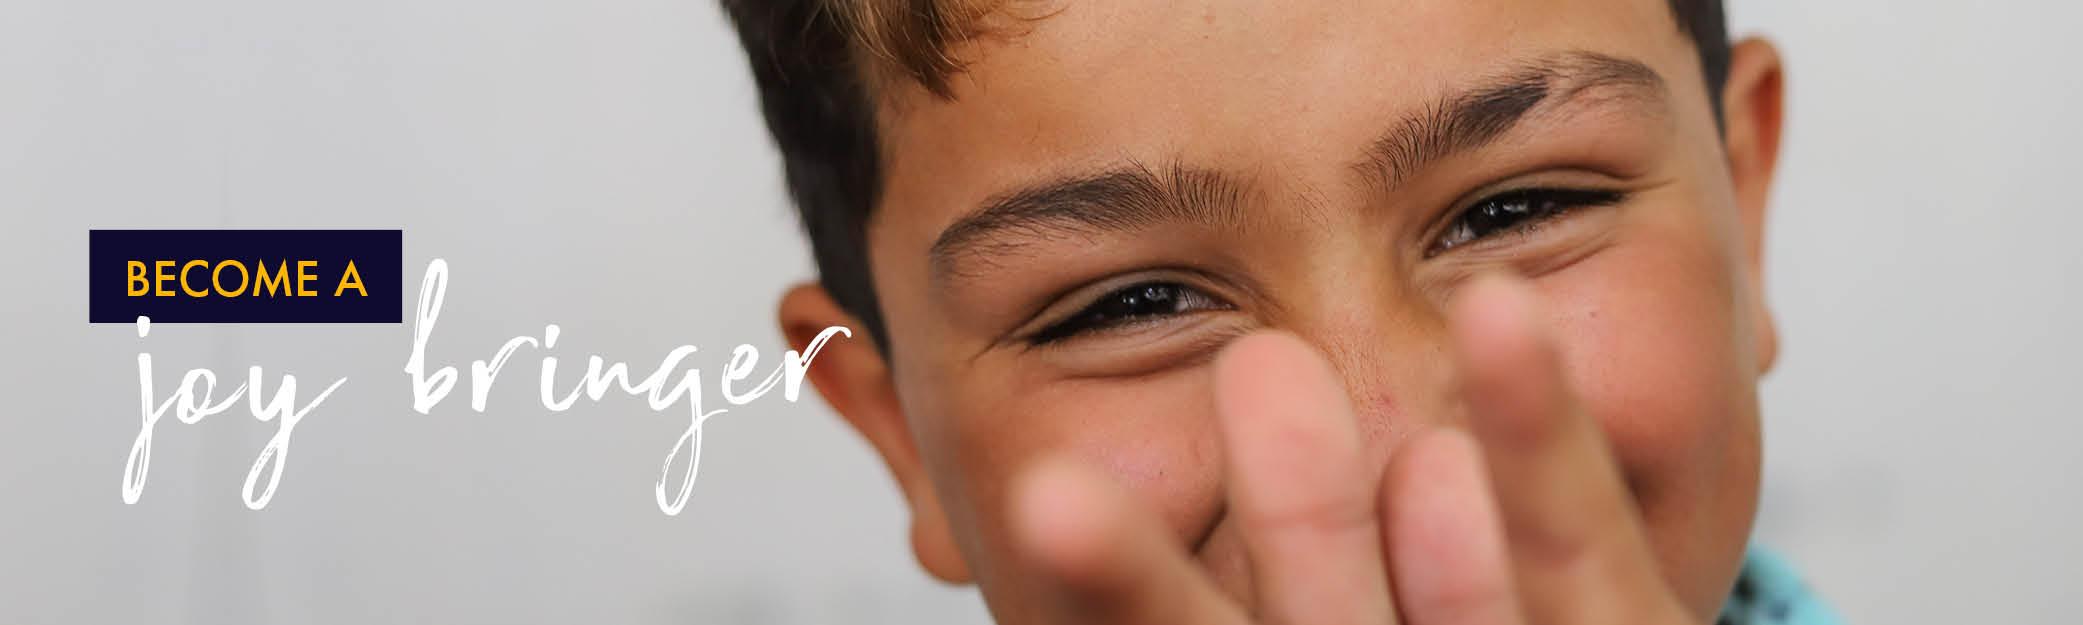 joybringer-web-header